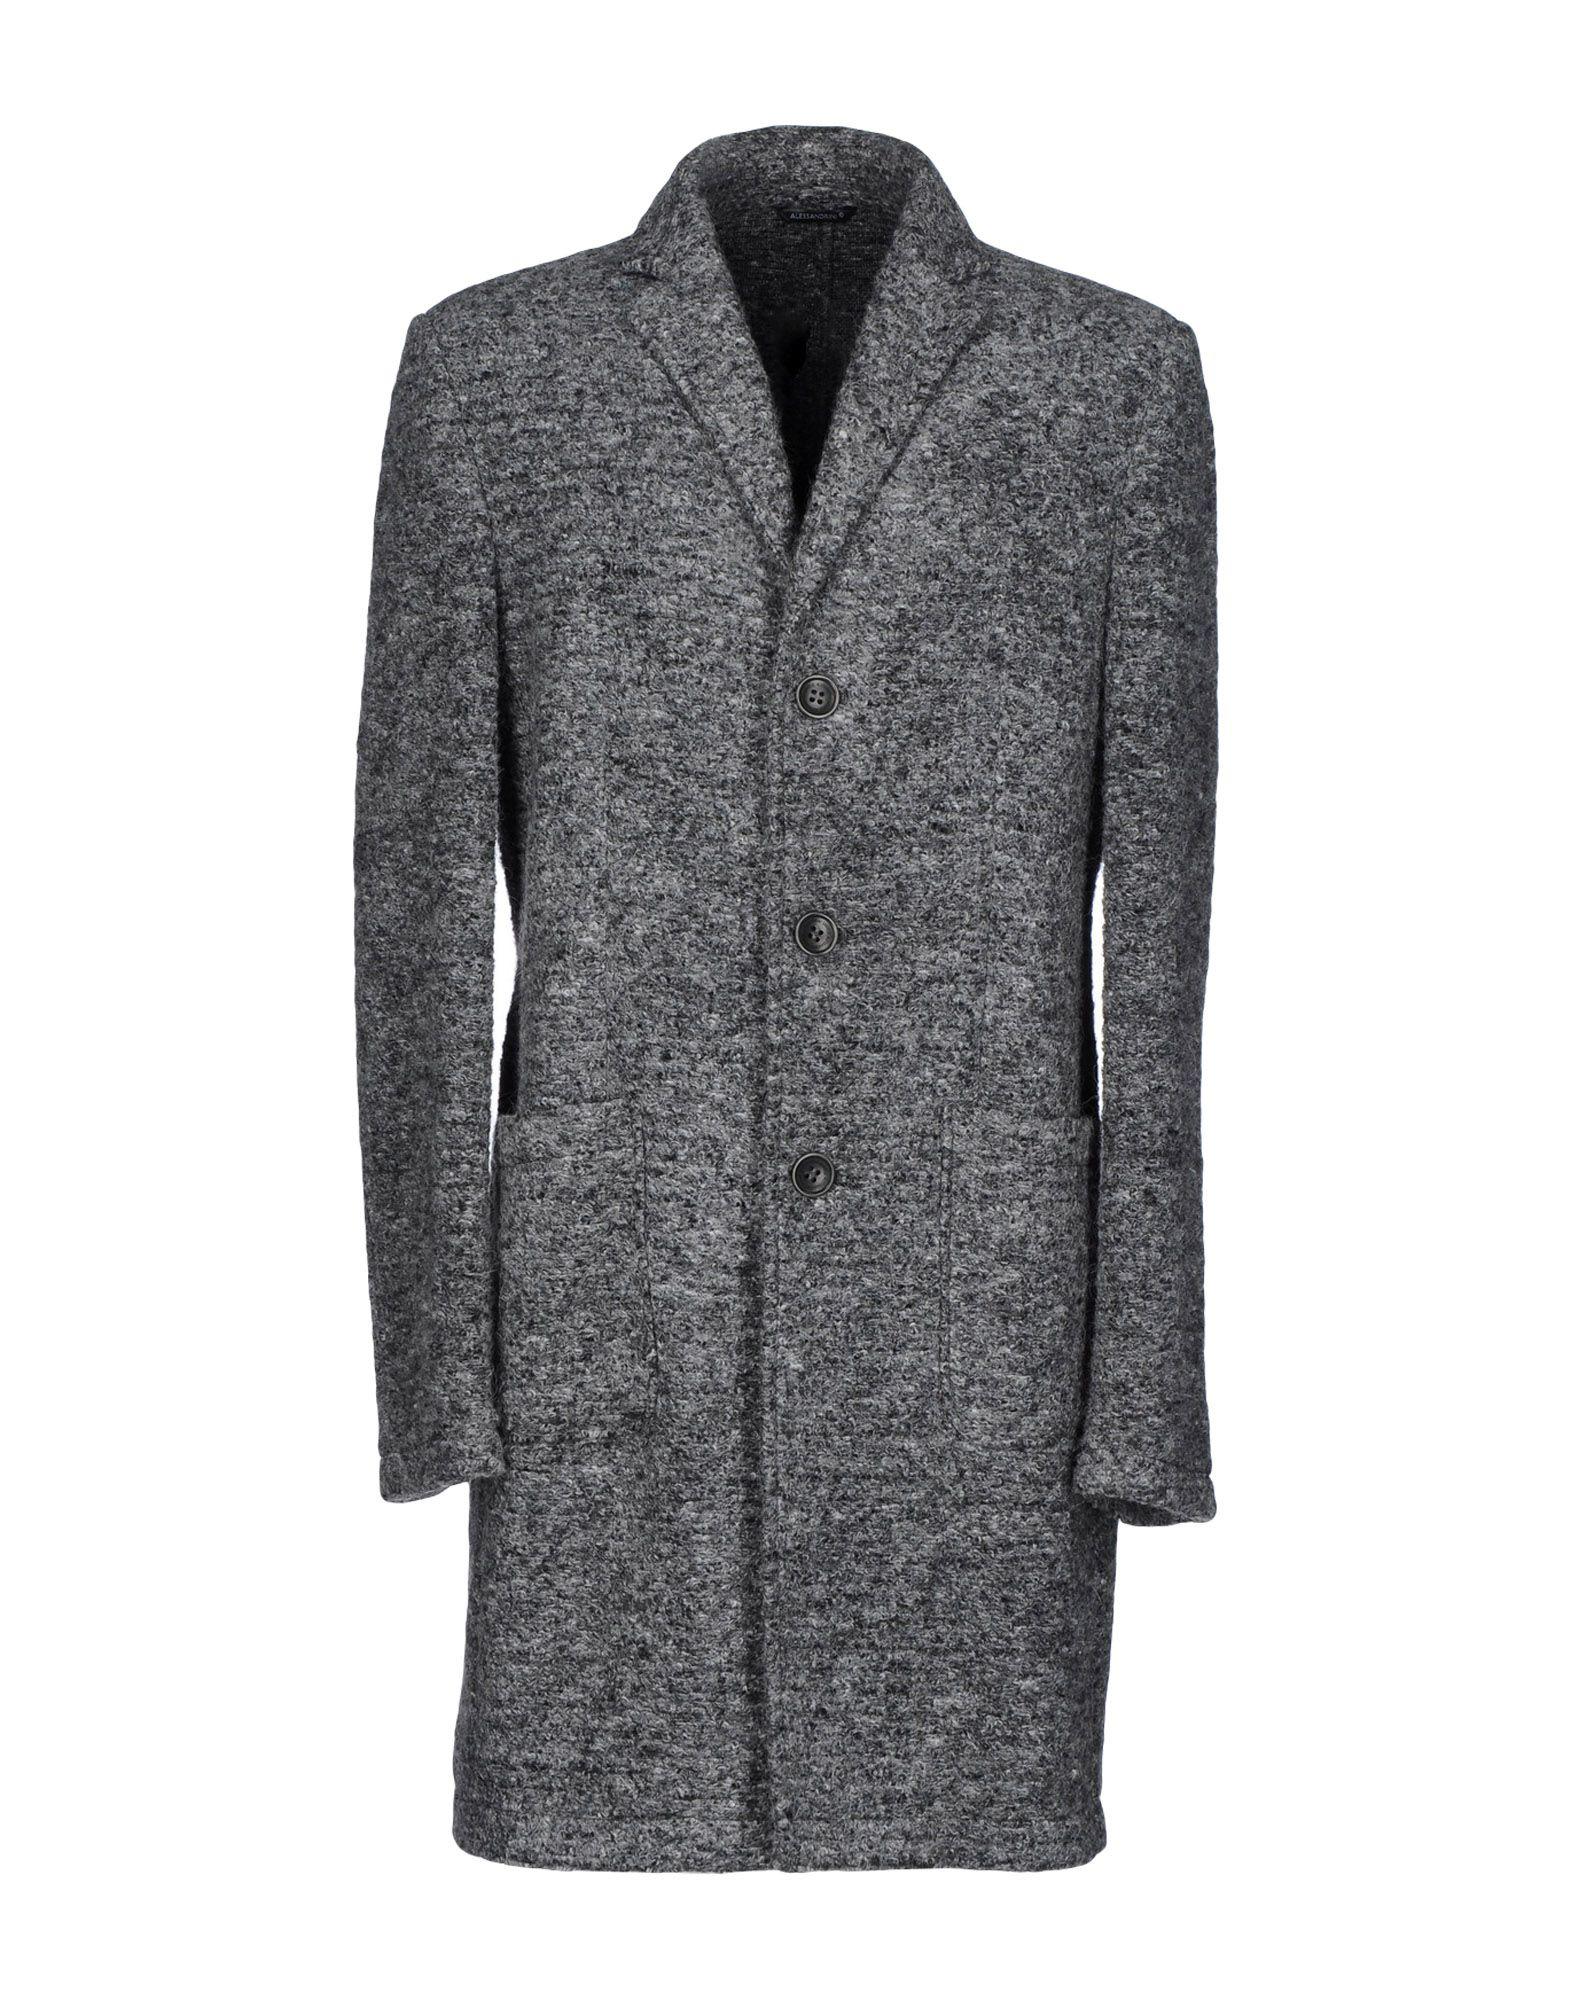 DANIELE ALESSANDRINI Herren Mantel Farbe Grau Größe 3